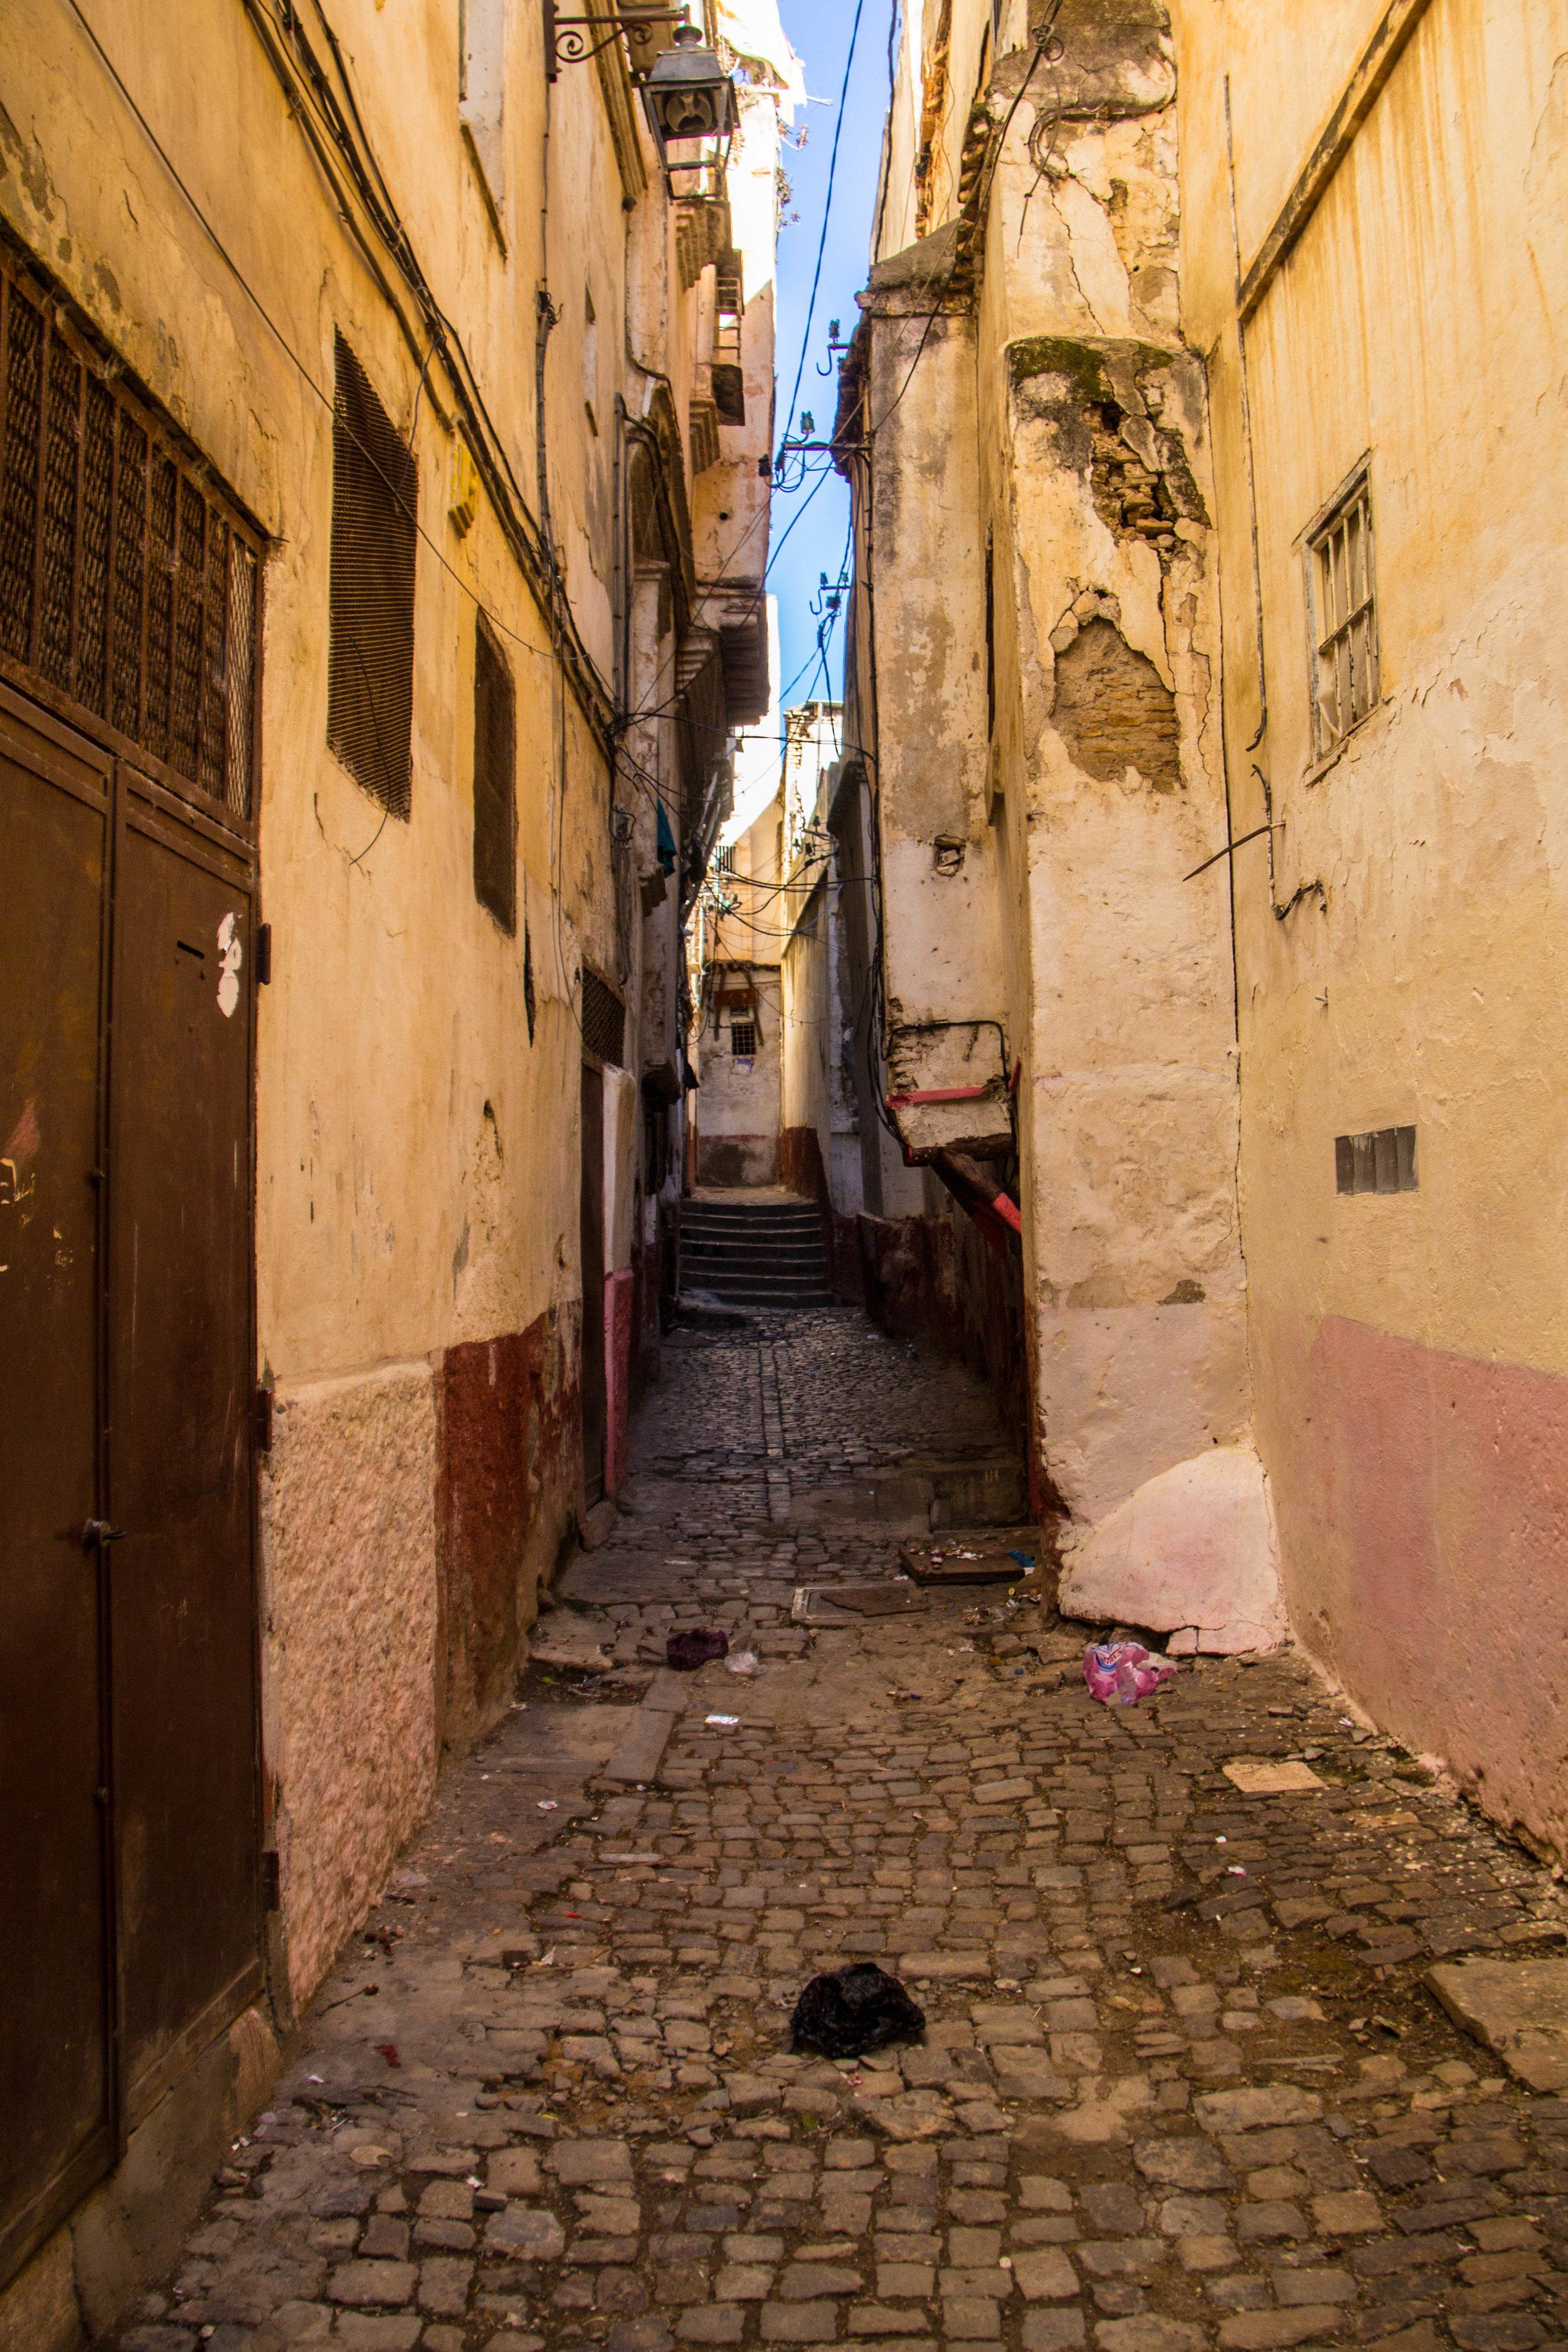 casbah-photography-algiers-algeria-alger-6.jpg